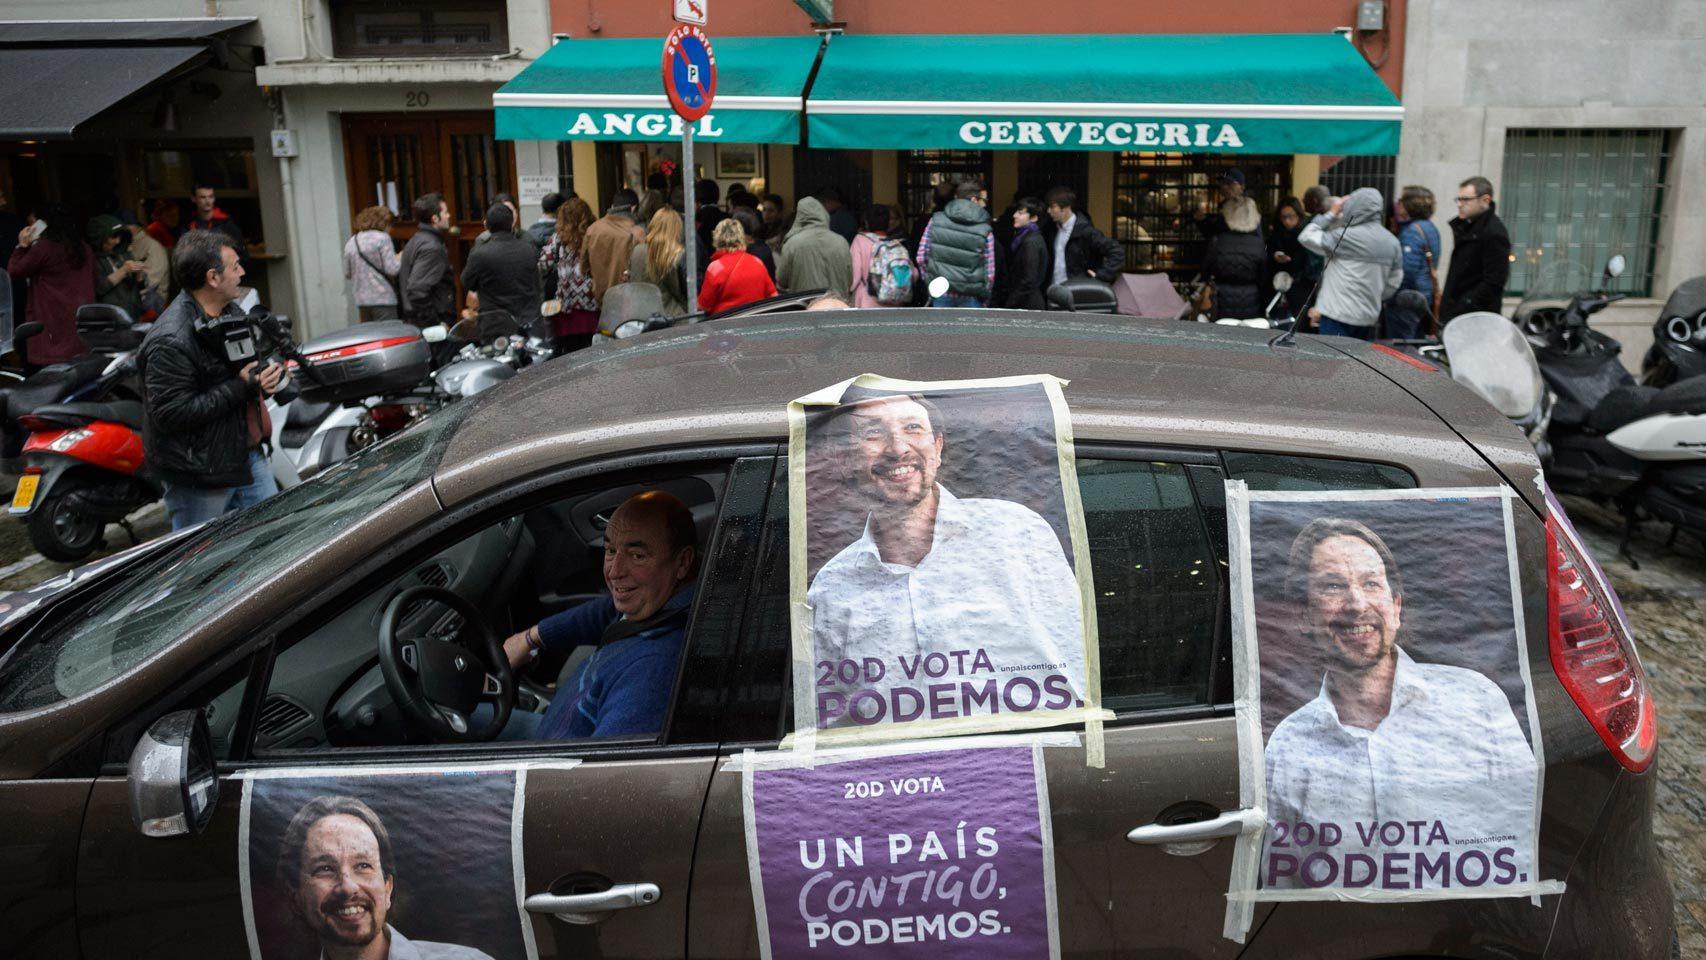 Un coche con propaganda de Podemos recorre las calles.